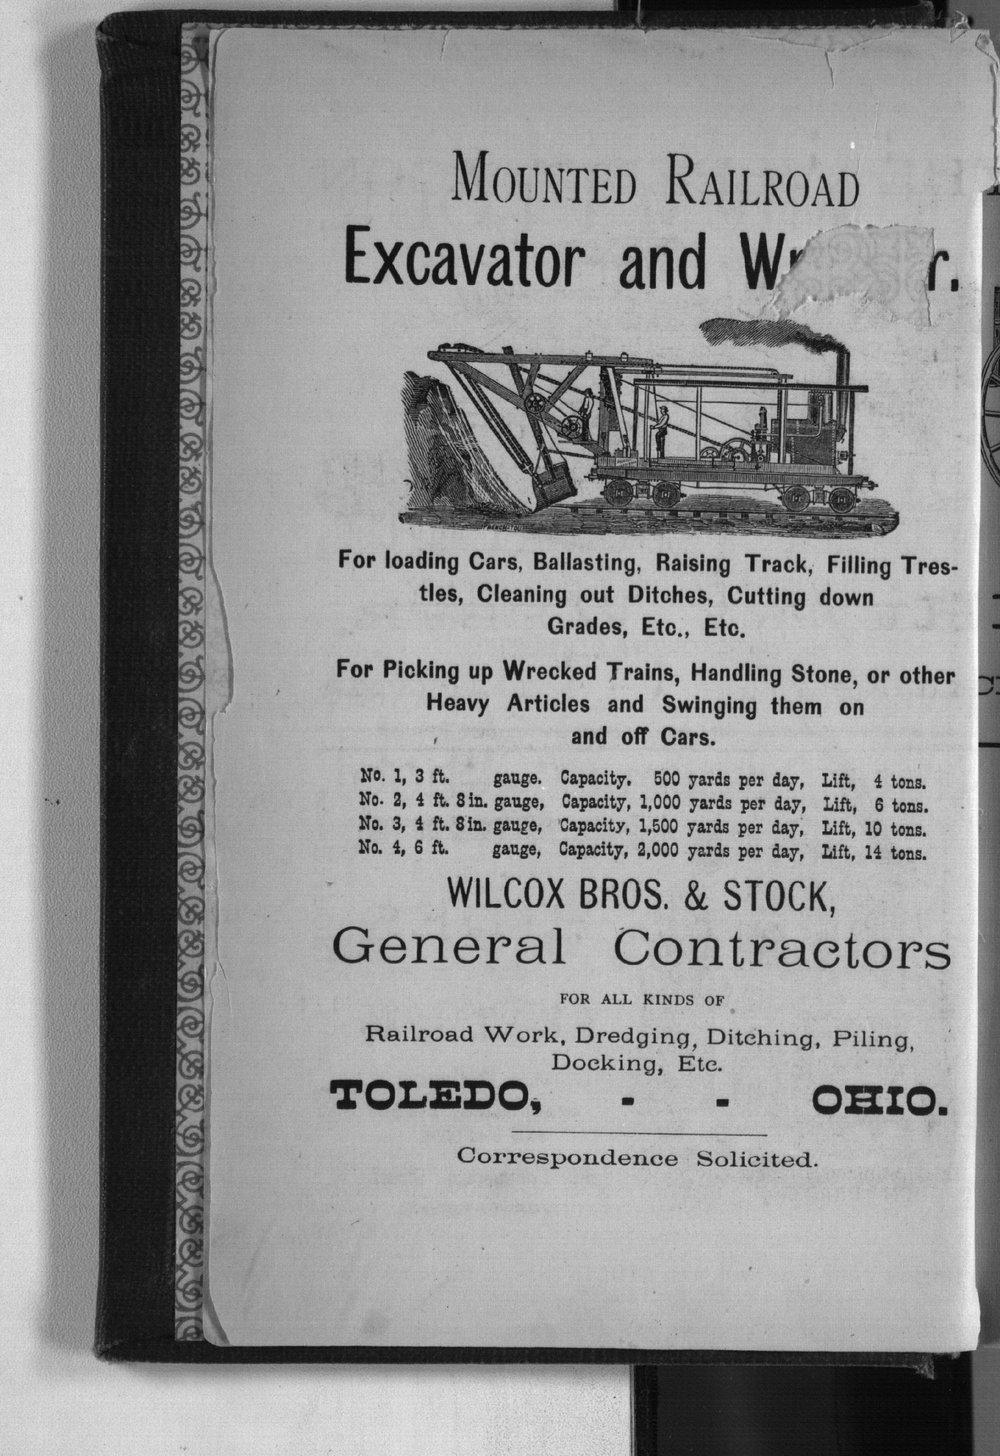 Kansas state gazetteer and business directory - advertisement